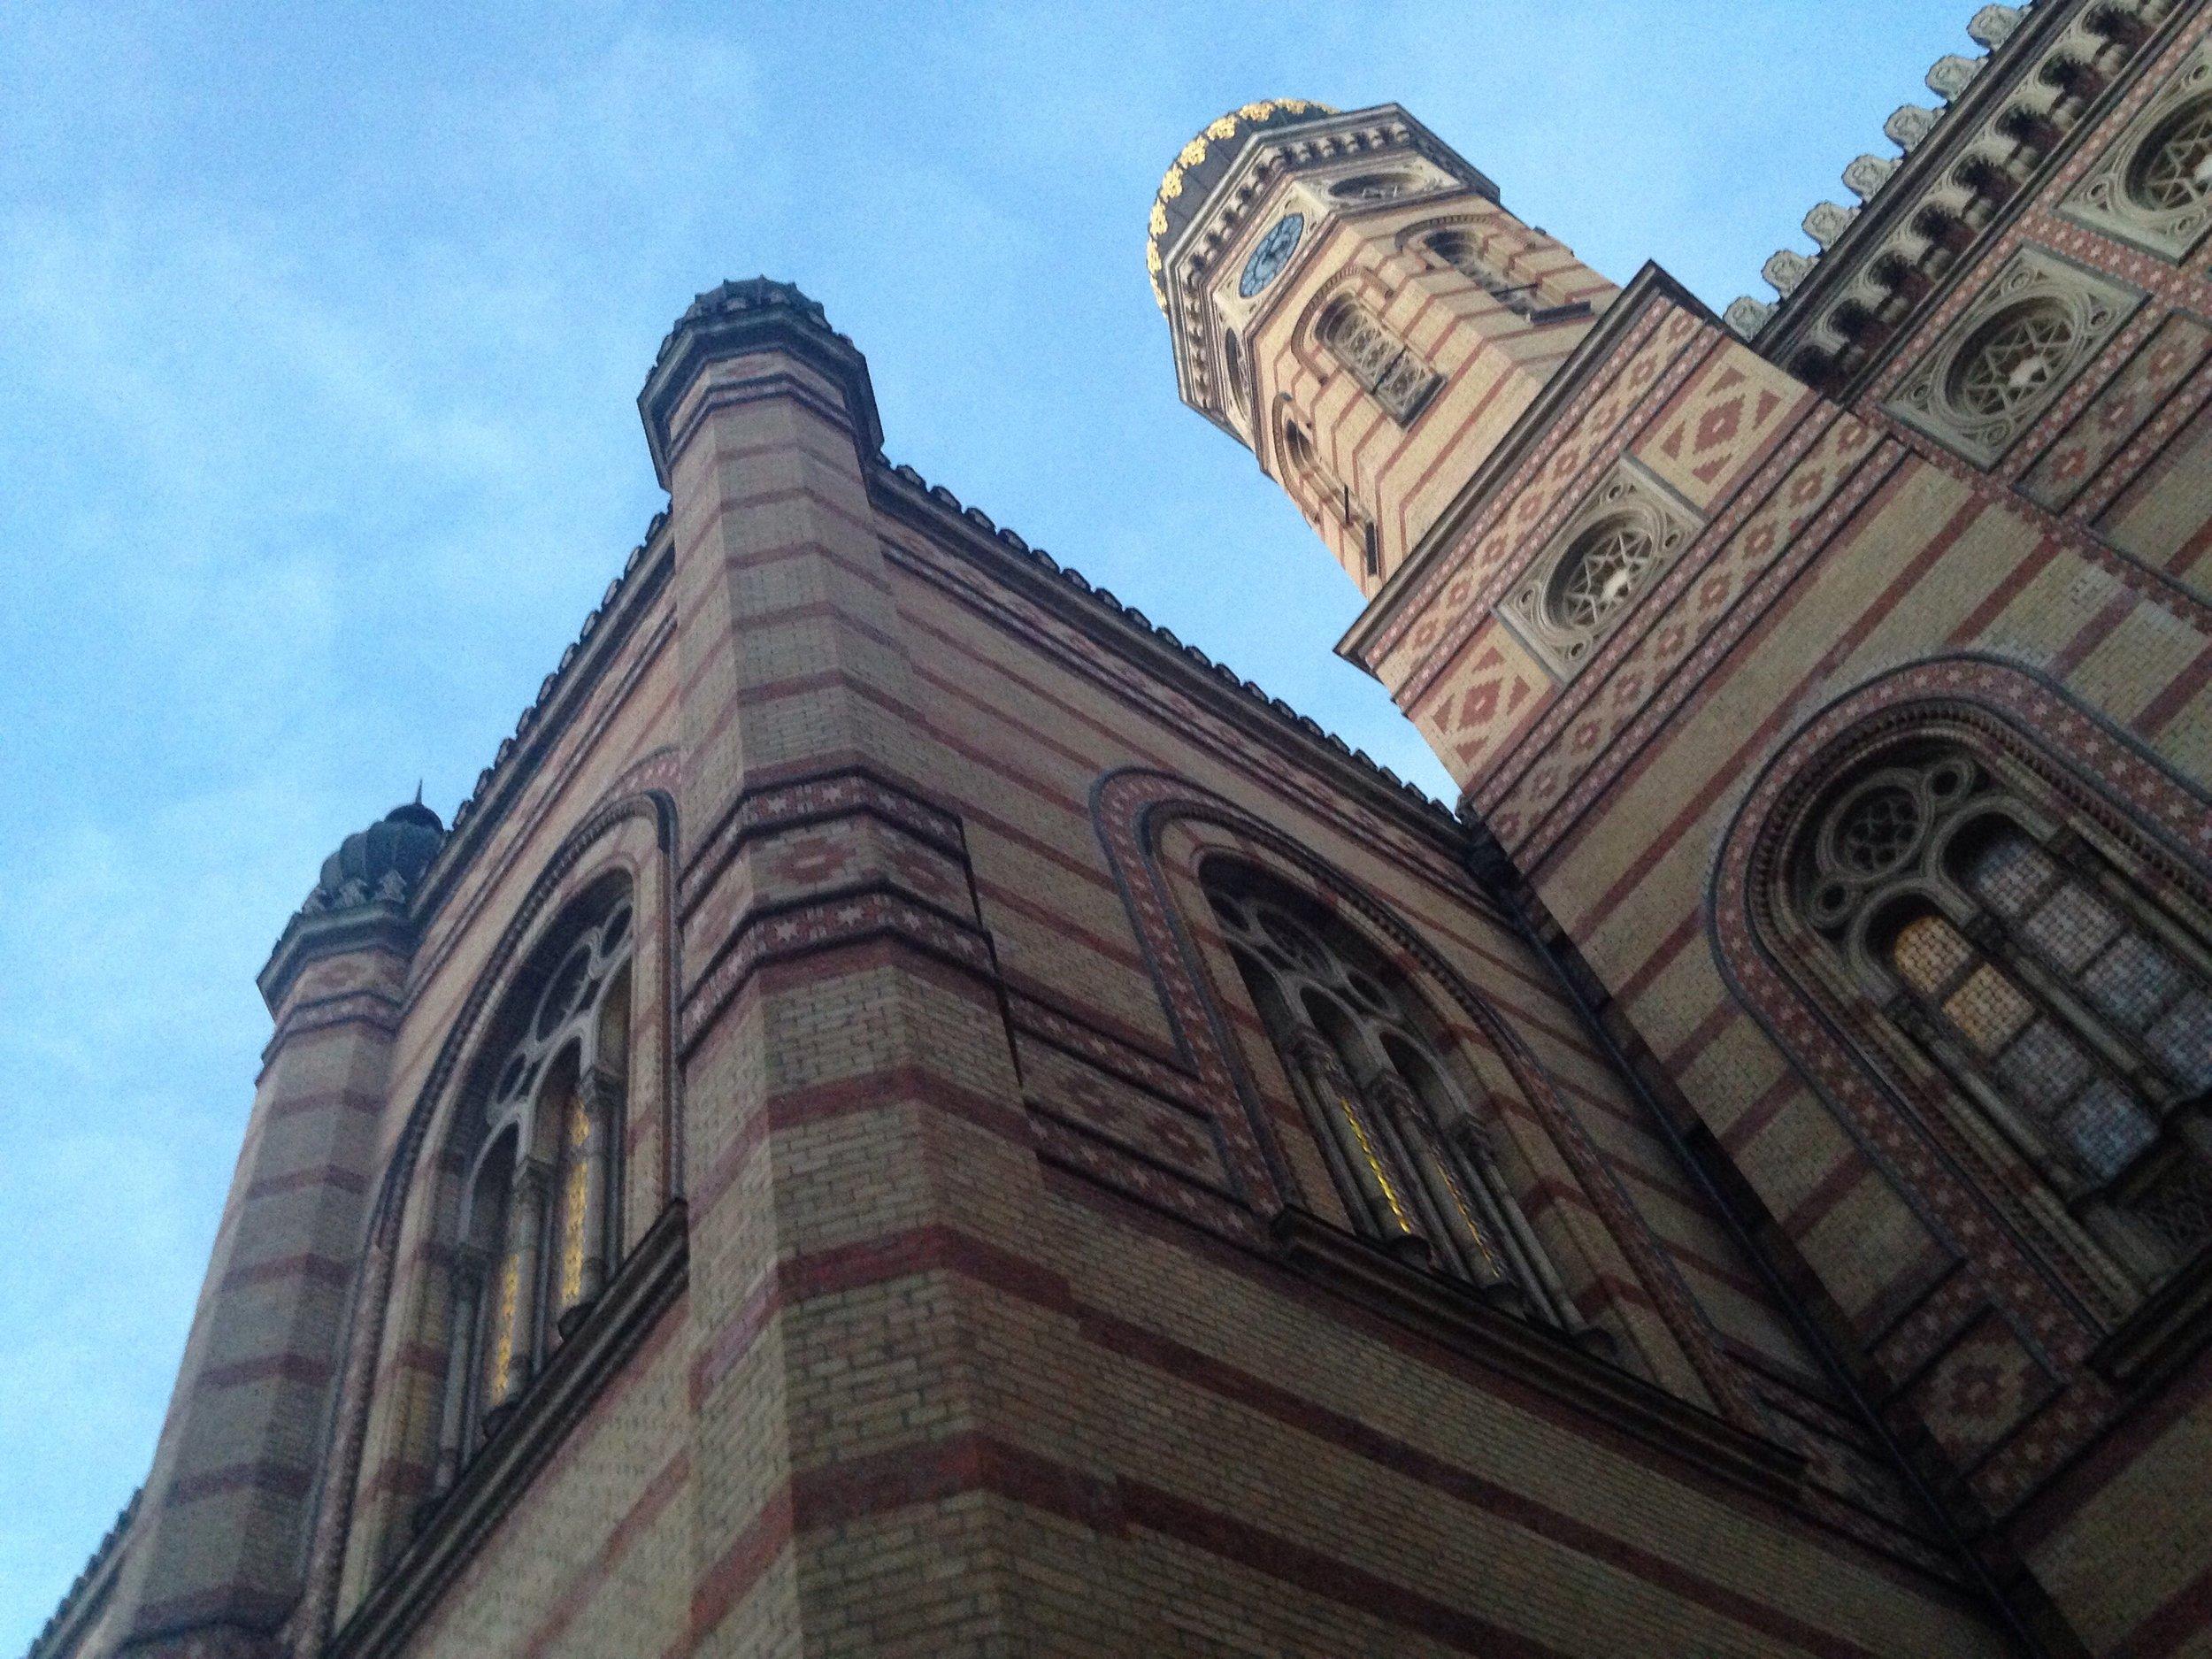 The Dohány Street Synagogue, Budapest, Hungary. © E.A. Crunden